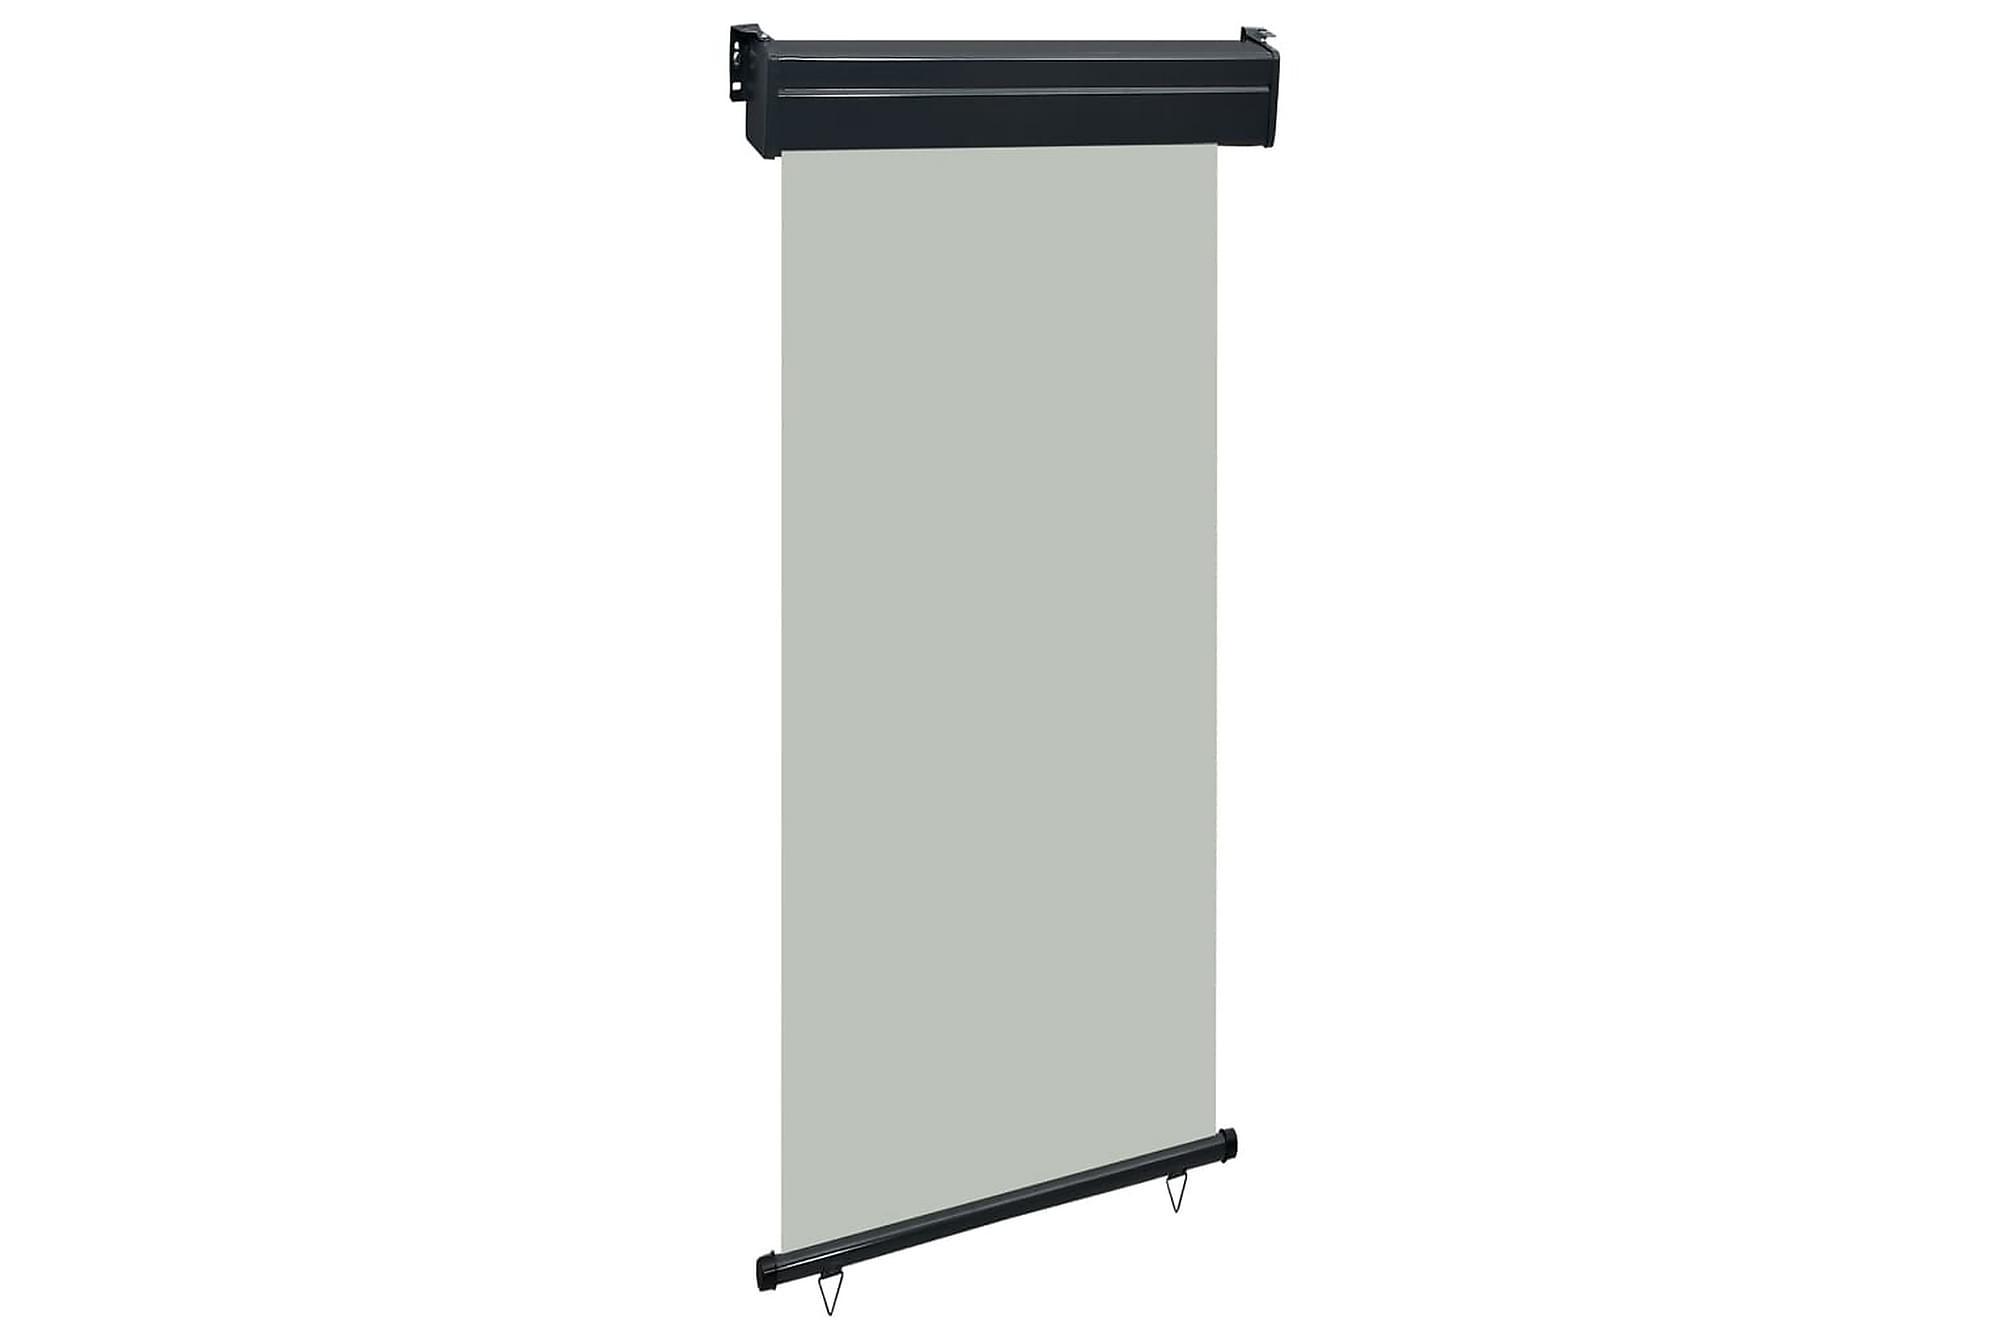 Balkongmarkis 100x250 cm grå, Markiser